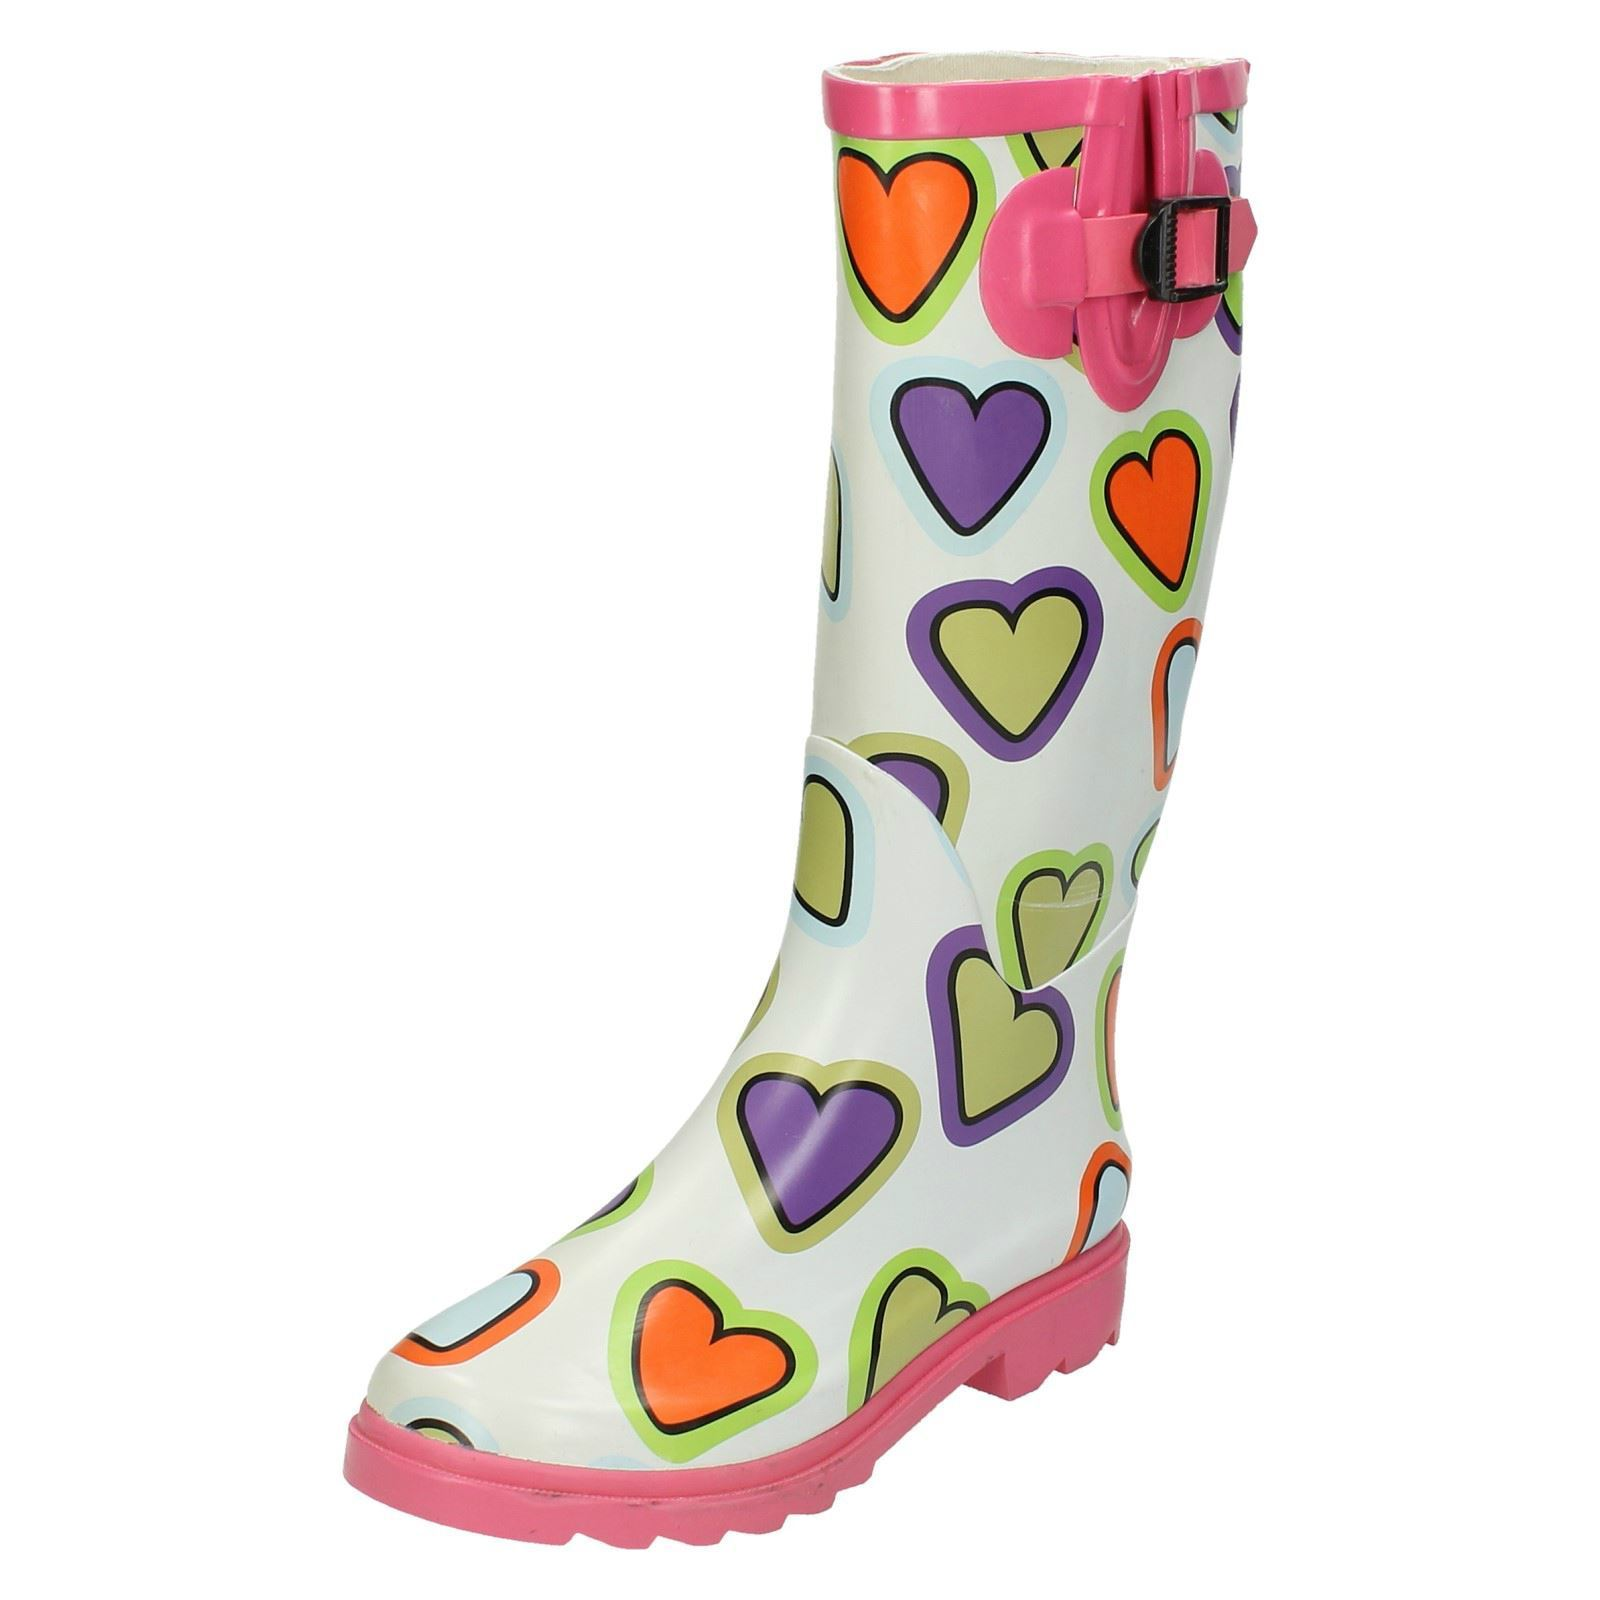 Heart AM1- Ladies Spoton Pink/White/Mul<wbr/>ti Heart Design Rubber Wellington Boots!